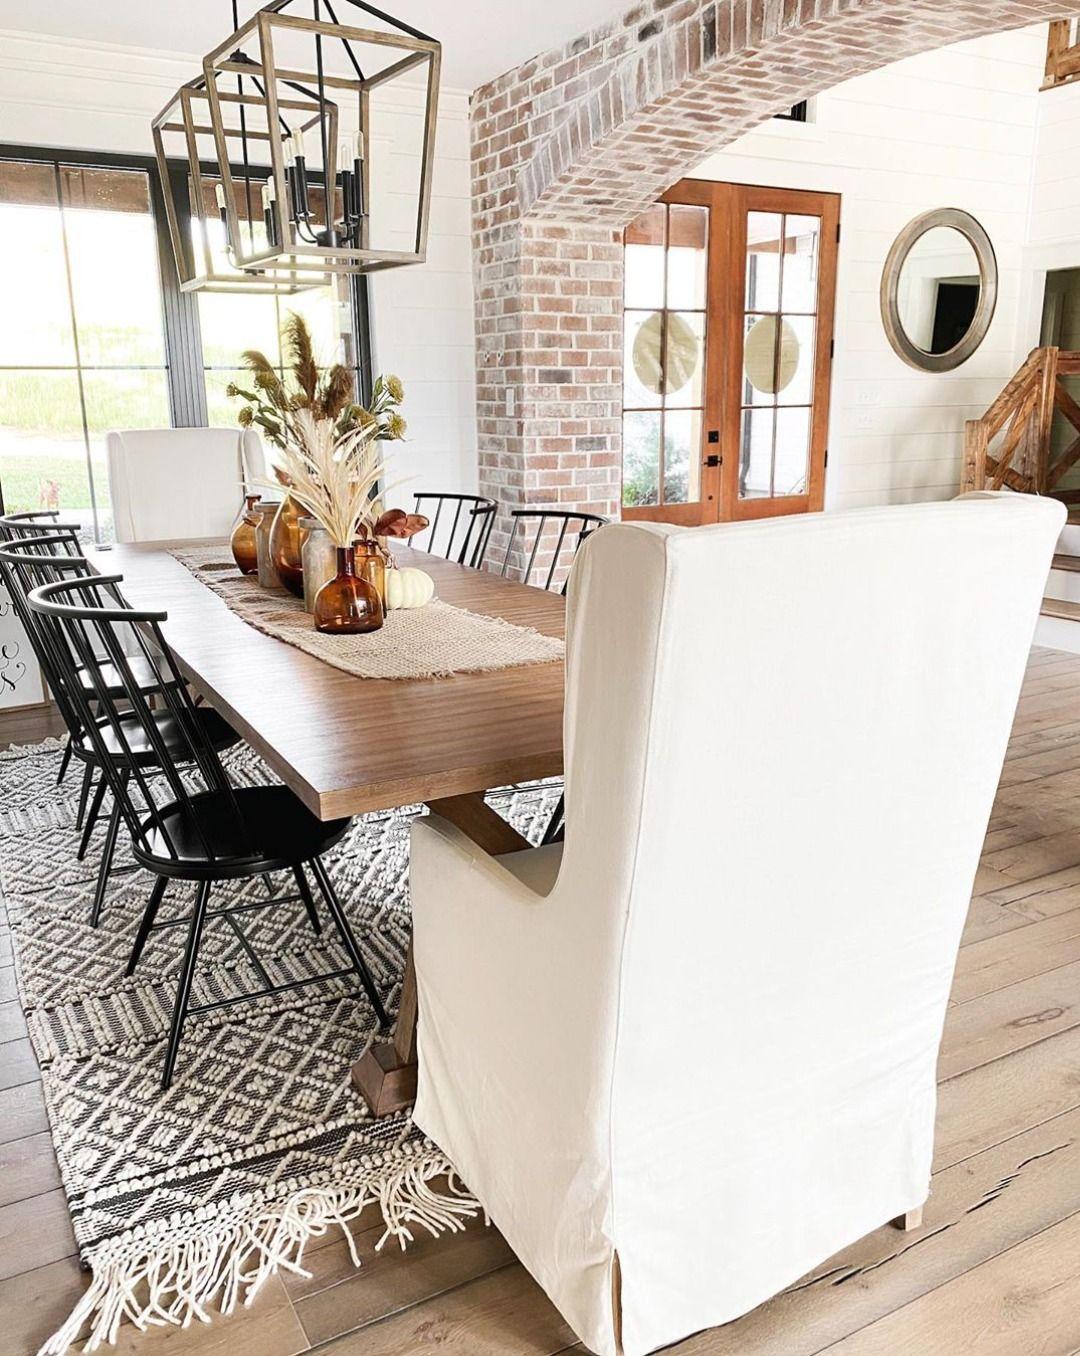 We love this beautiful space!❤️ Designed by @parkberryfarmhouse #boutiquerugs #arearug #modernrugs #farmhousedecor #farmhousestyle #moderndecor #modernstyle #styleyourspace #rugsofinstagram #designerrug #rugs #handmaderugs #ruglove #homedesign #interiorstyle #modernhome #ourhome #instalove #instagood #love #ourcustomersrock #reviews #realhomesofinstagram #roominspo #home #farmhousefamily #diningroomdesign #diningroomdecor